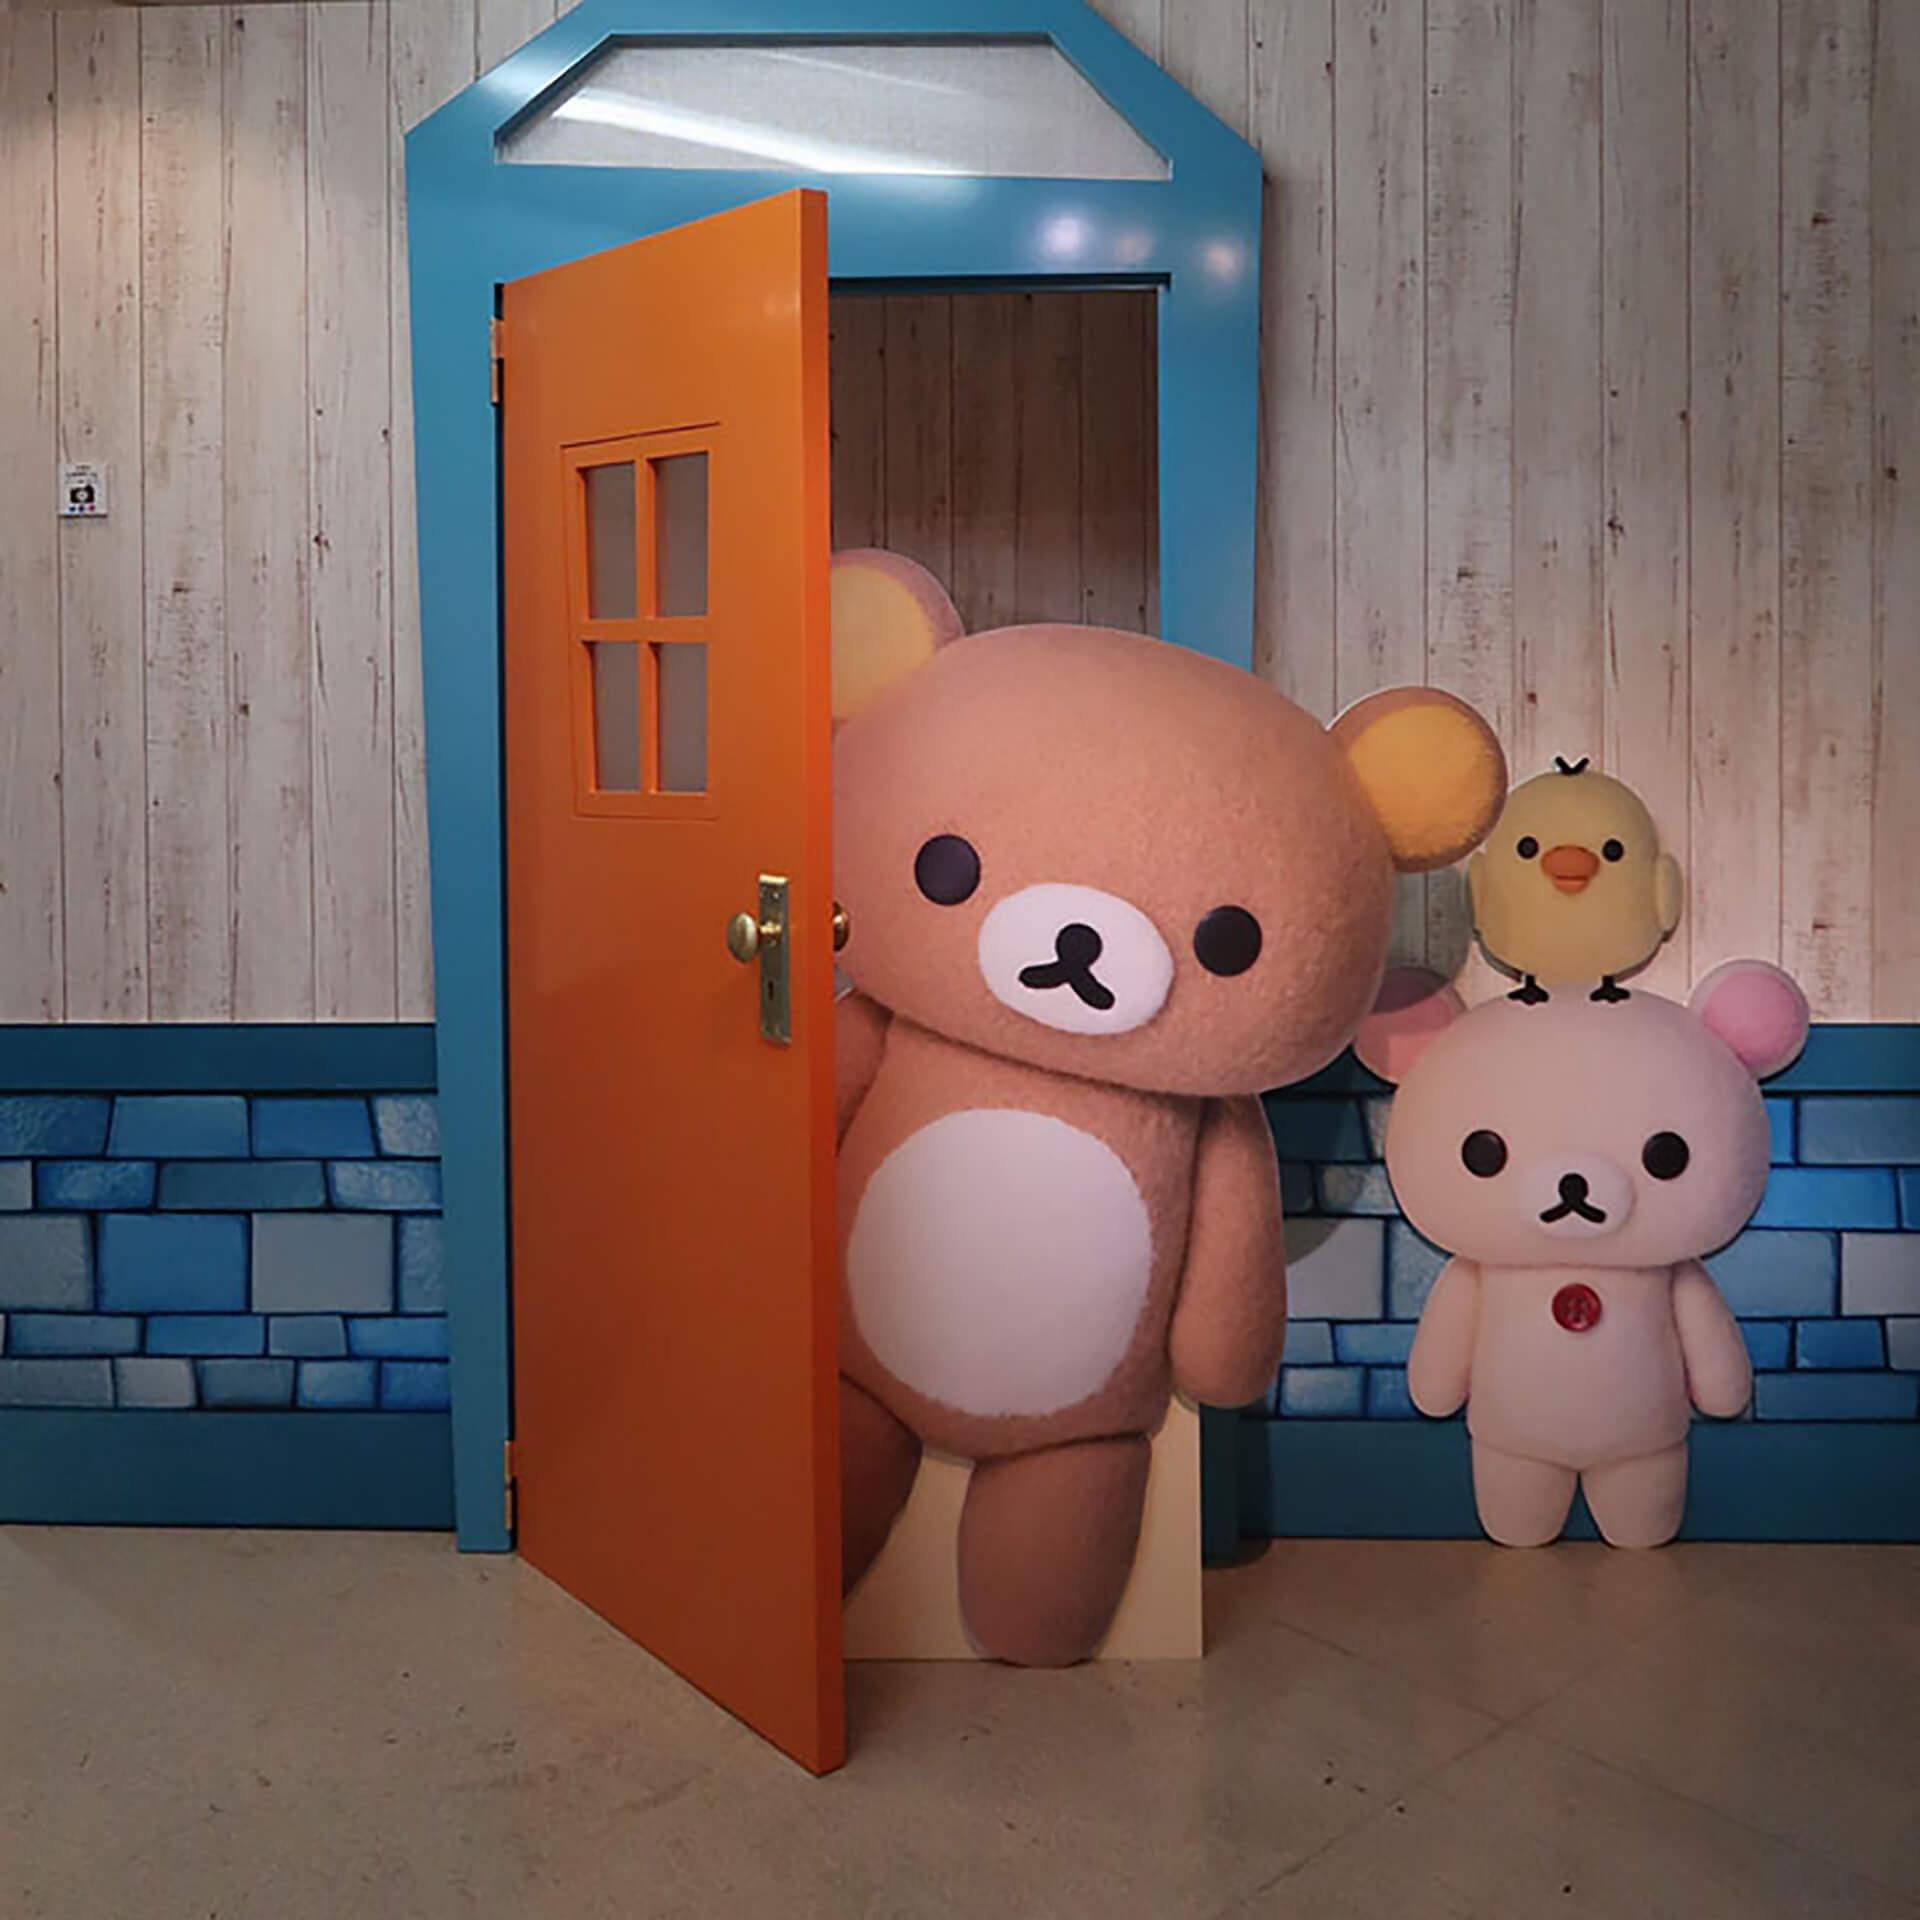 Netflix オリジナルシリーズ リラックマとカオルさん展